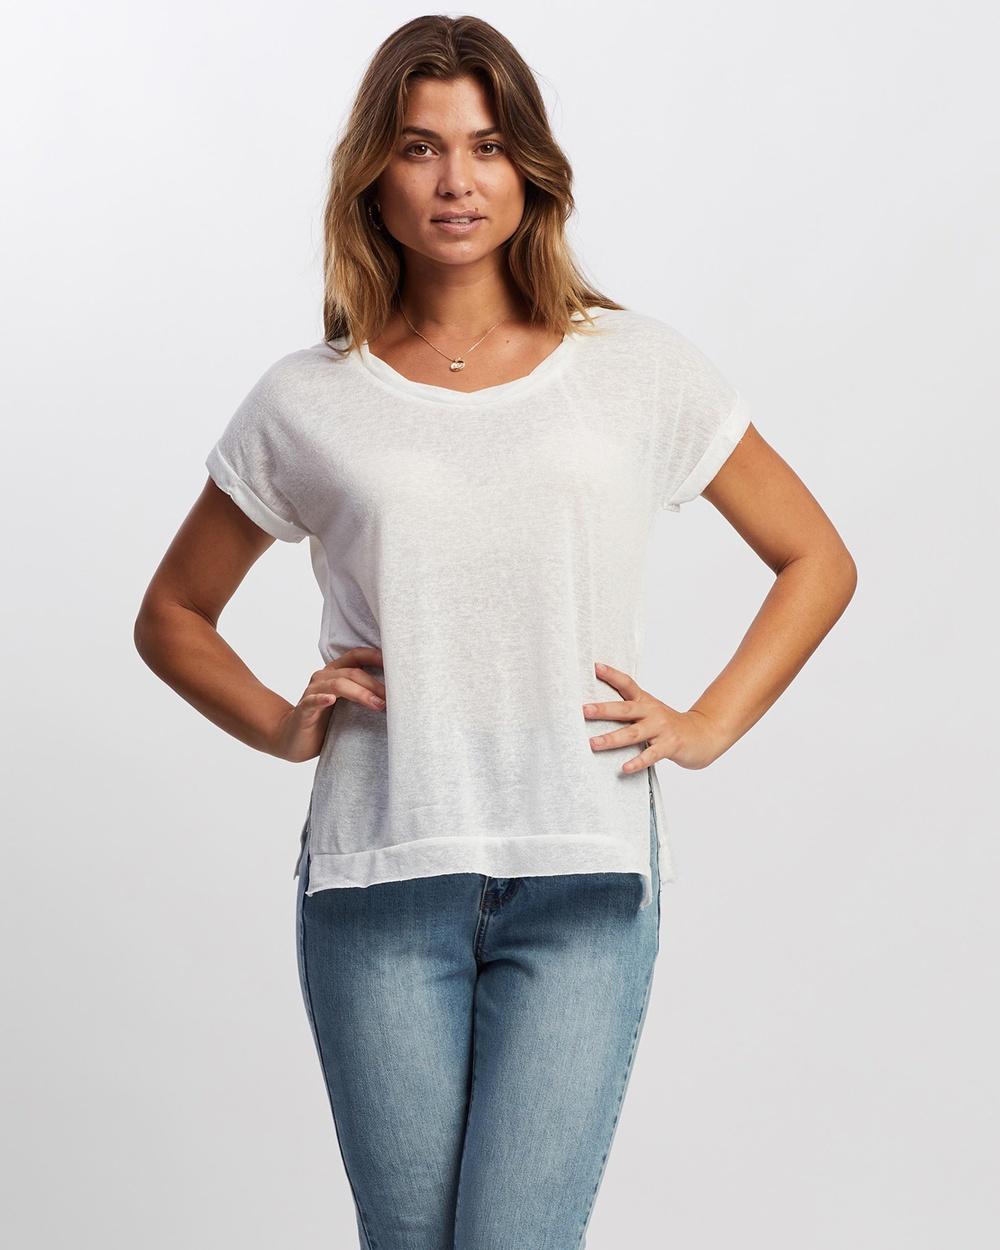 Atmos&Here - Ariel Twist Neck T Shirt - T-Shirts & Singlets (White) Ariel Twist Neck T-Shirt